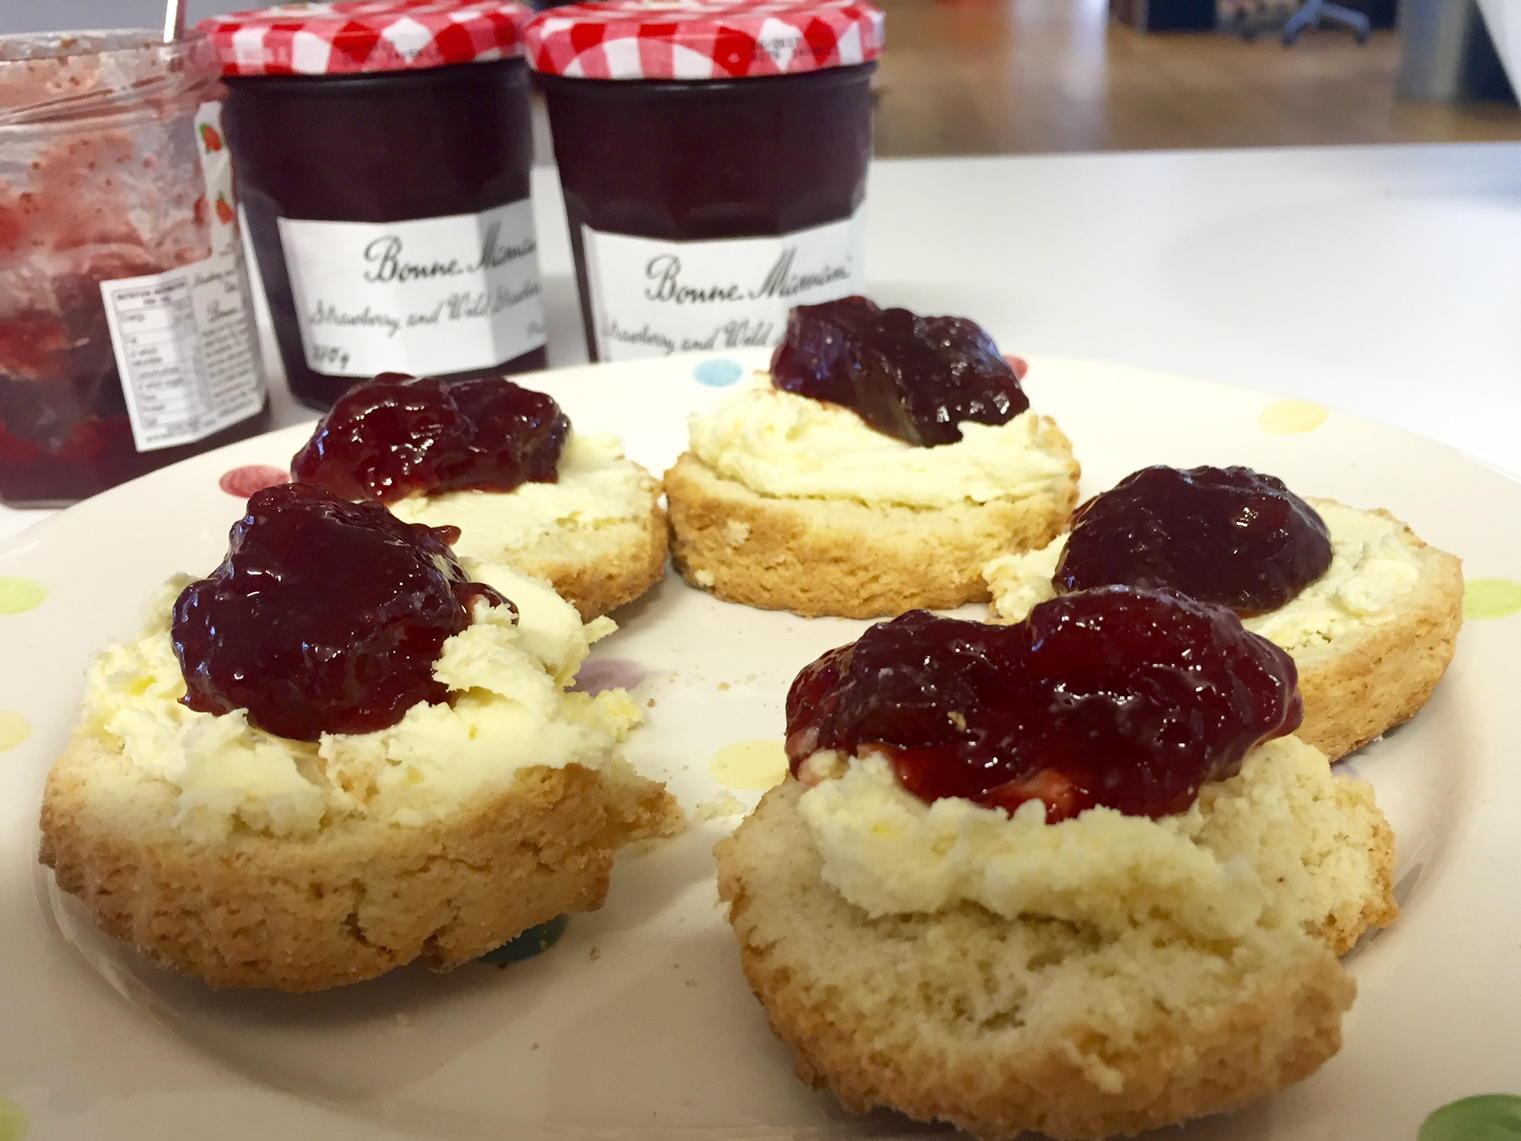 Afternoon tea  (N.B. Using gluten free flour makes scones taste so, so much worse) http://t.co/phBhzw0cWV